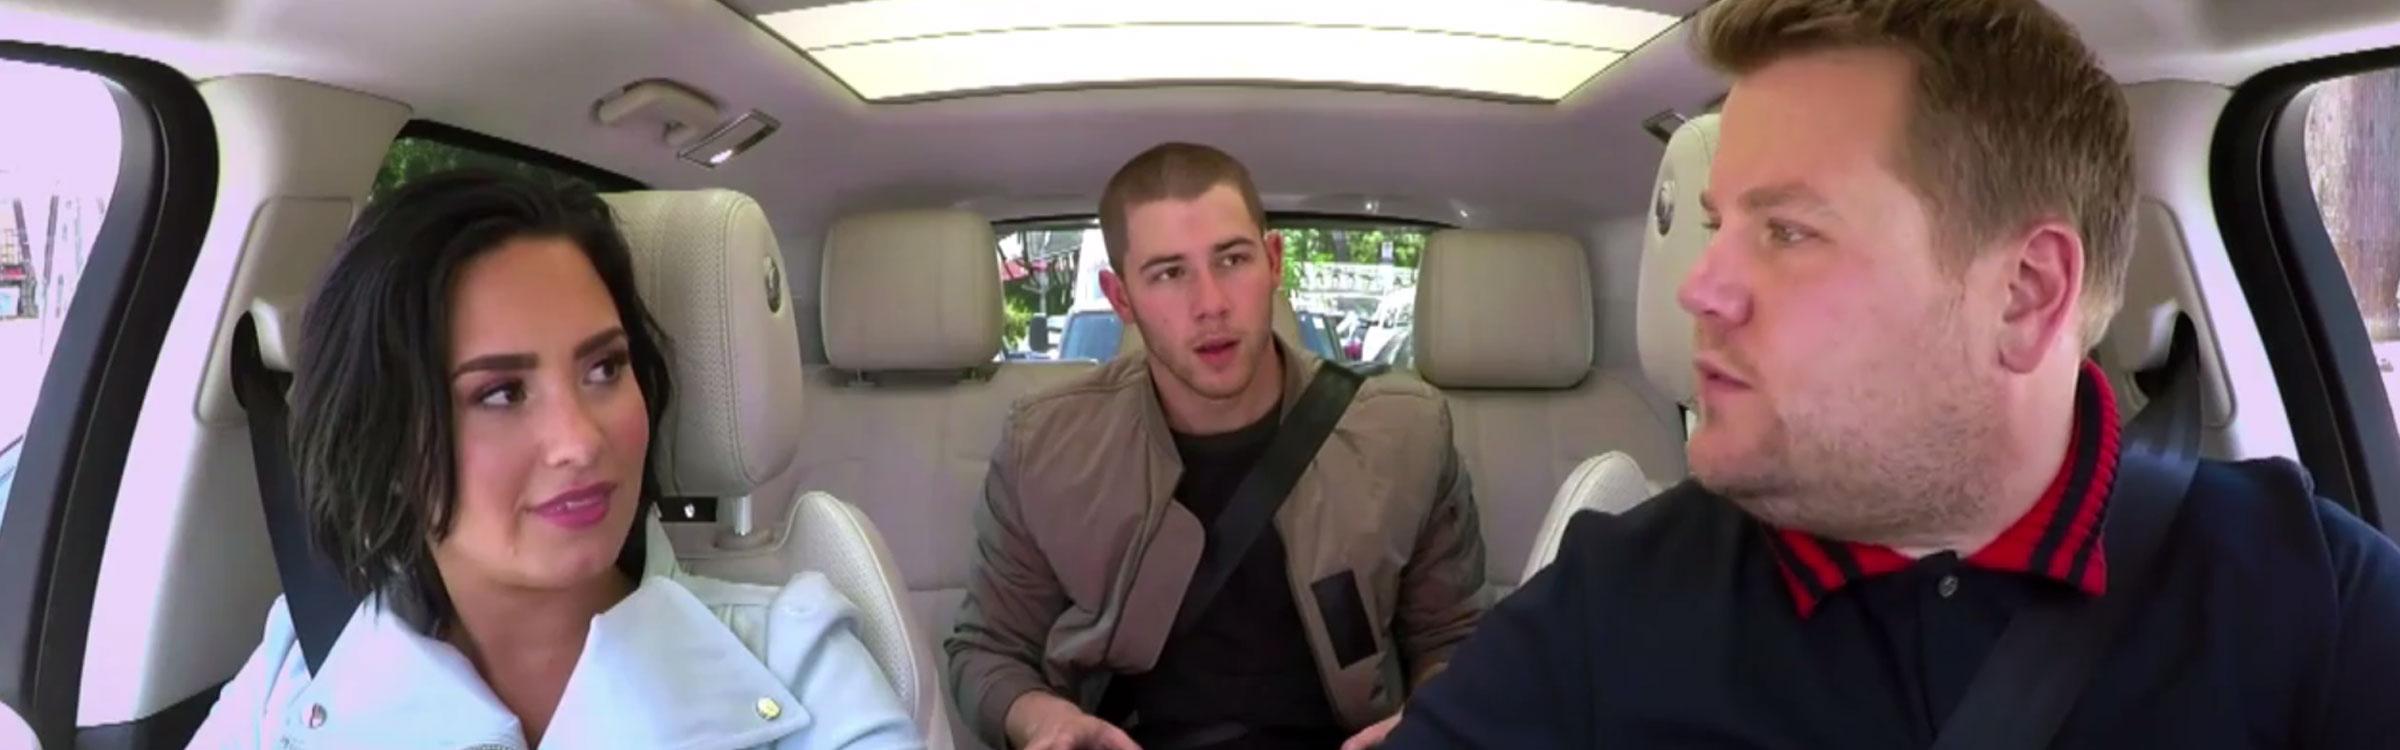 Carpool karaoke demi nick header